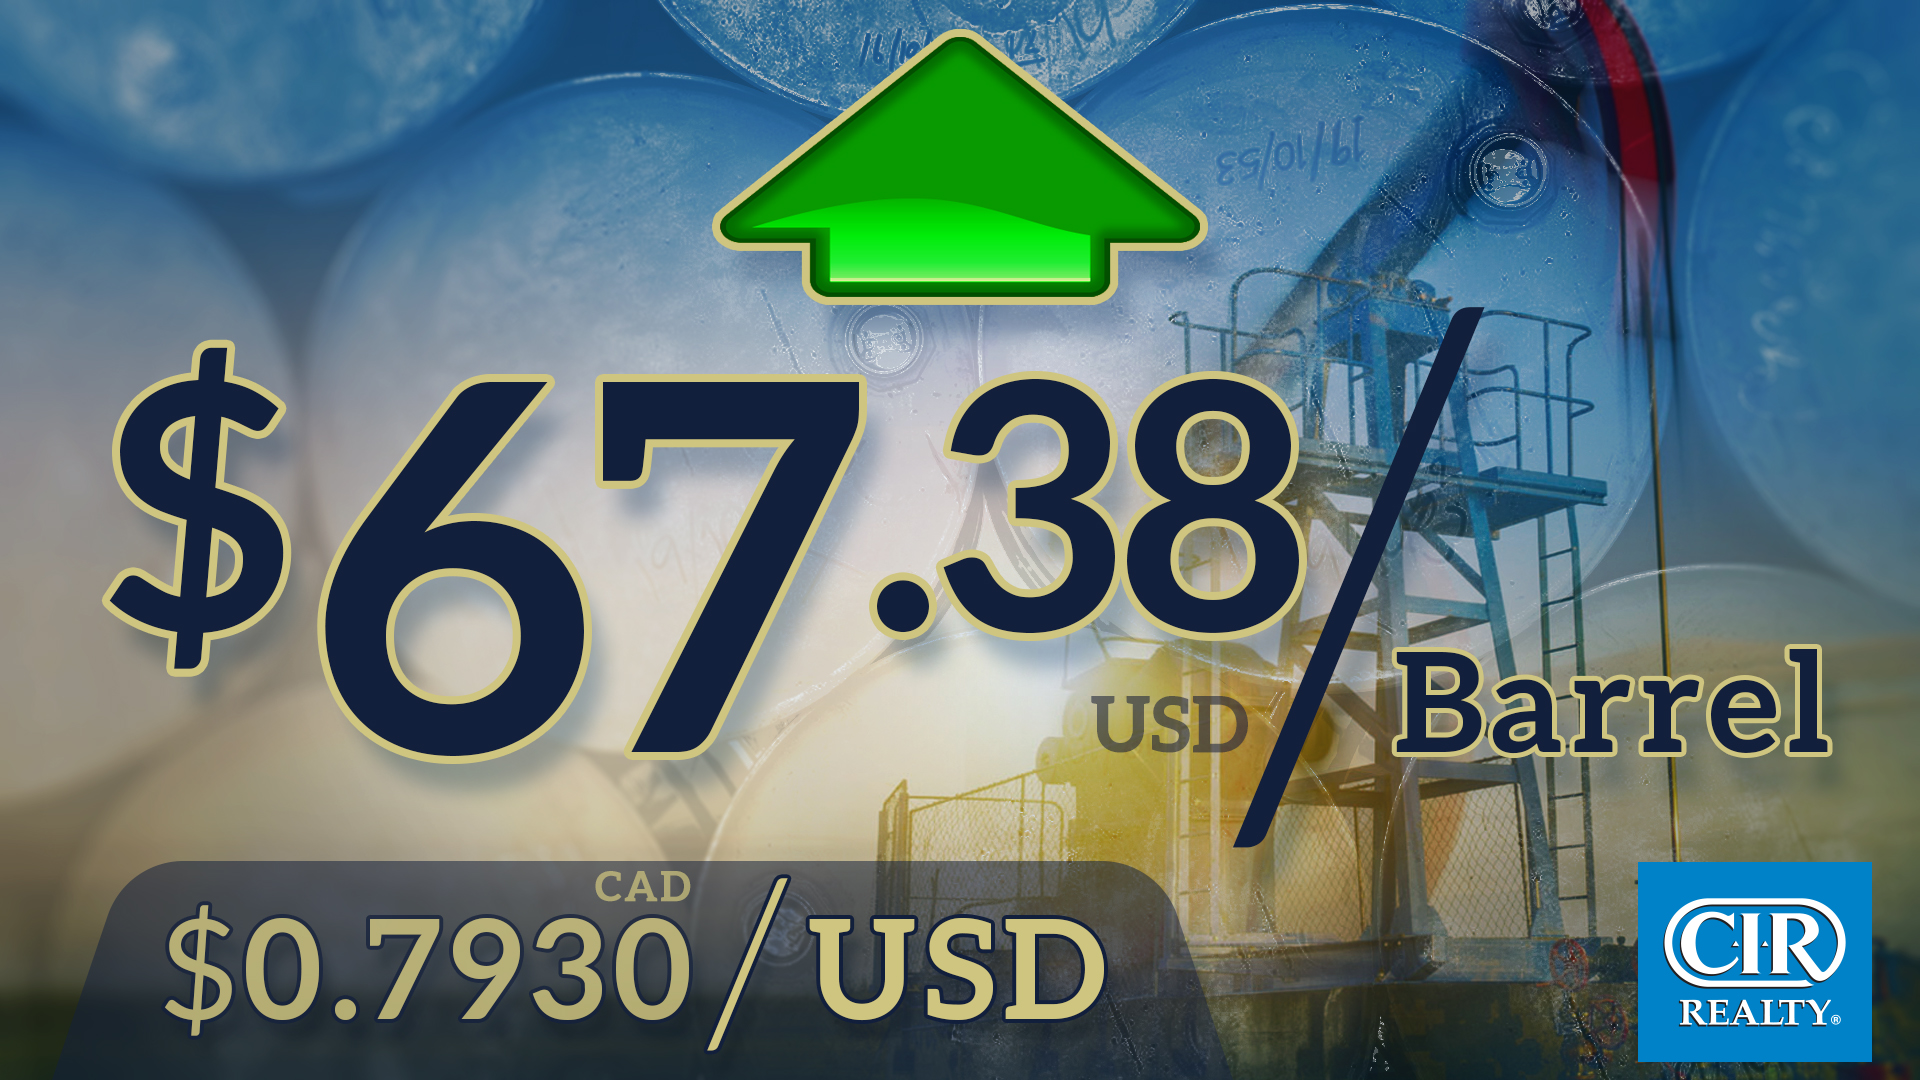 Oil Prices April 16, 2018